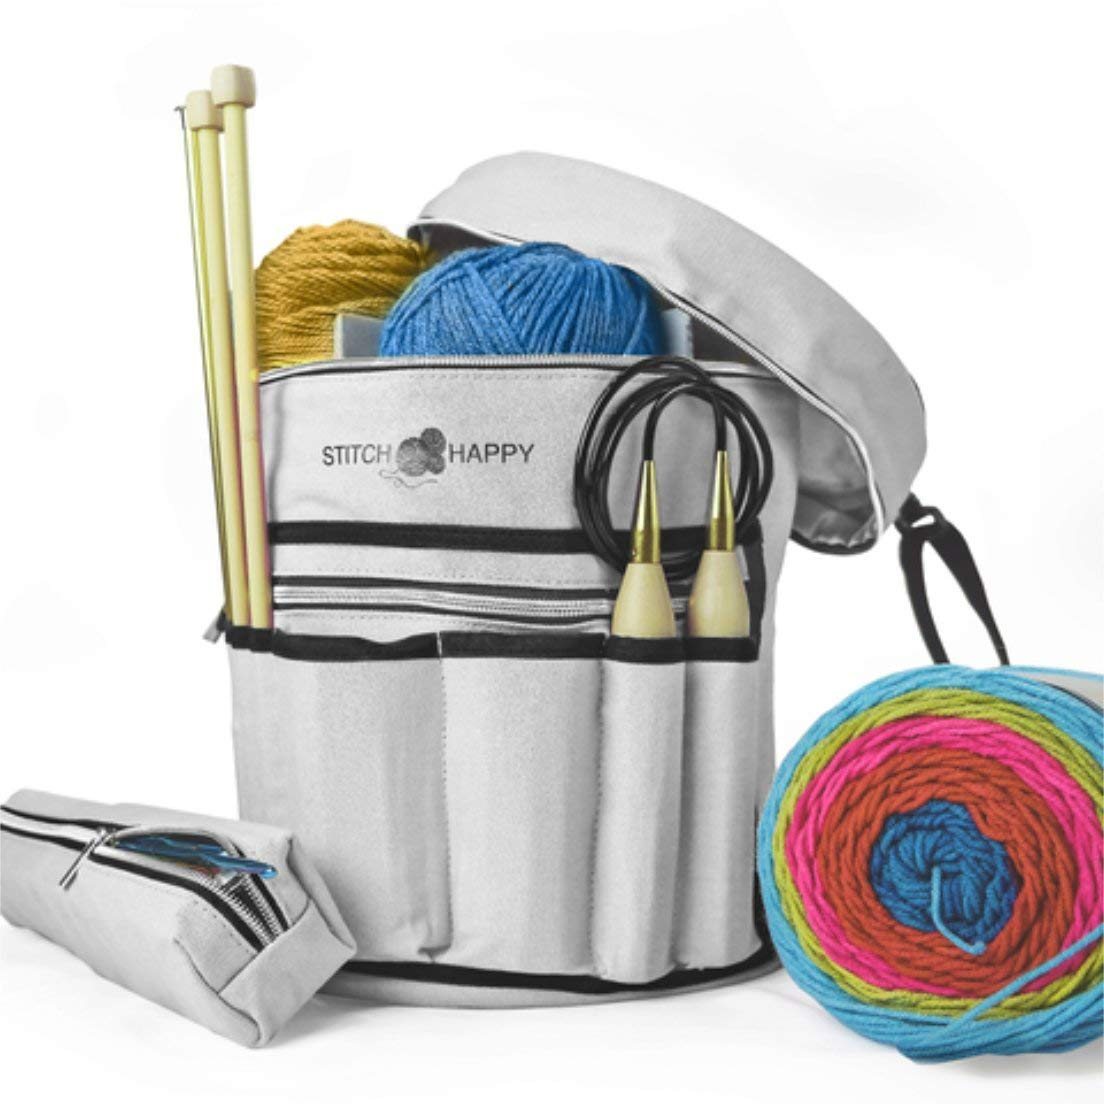 Stitch Happy Knitting Tote Bag